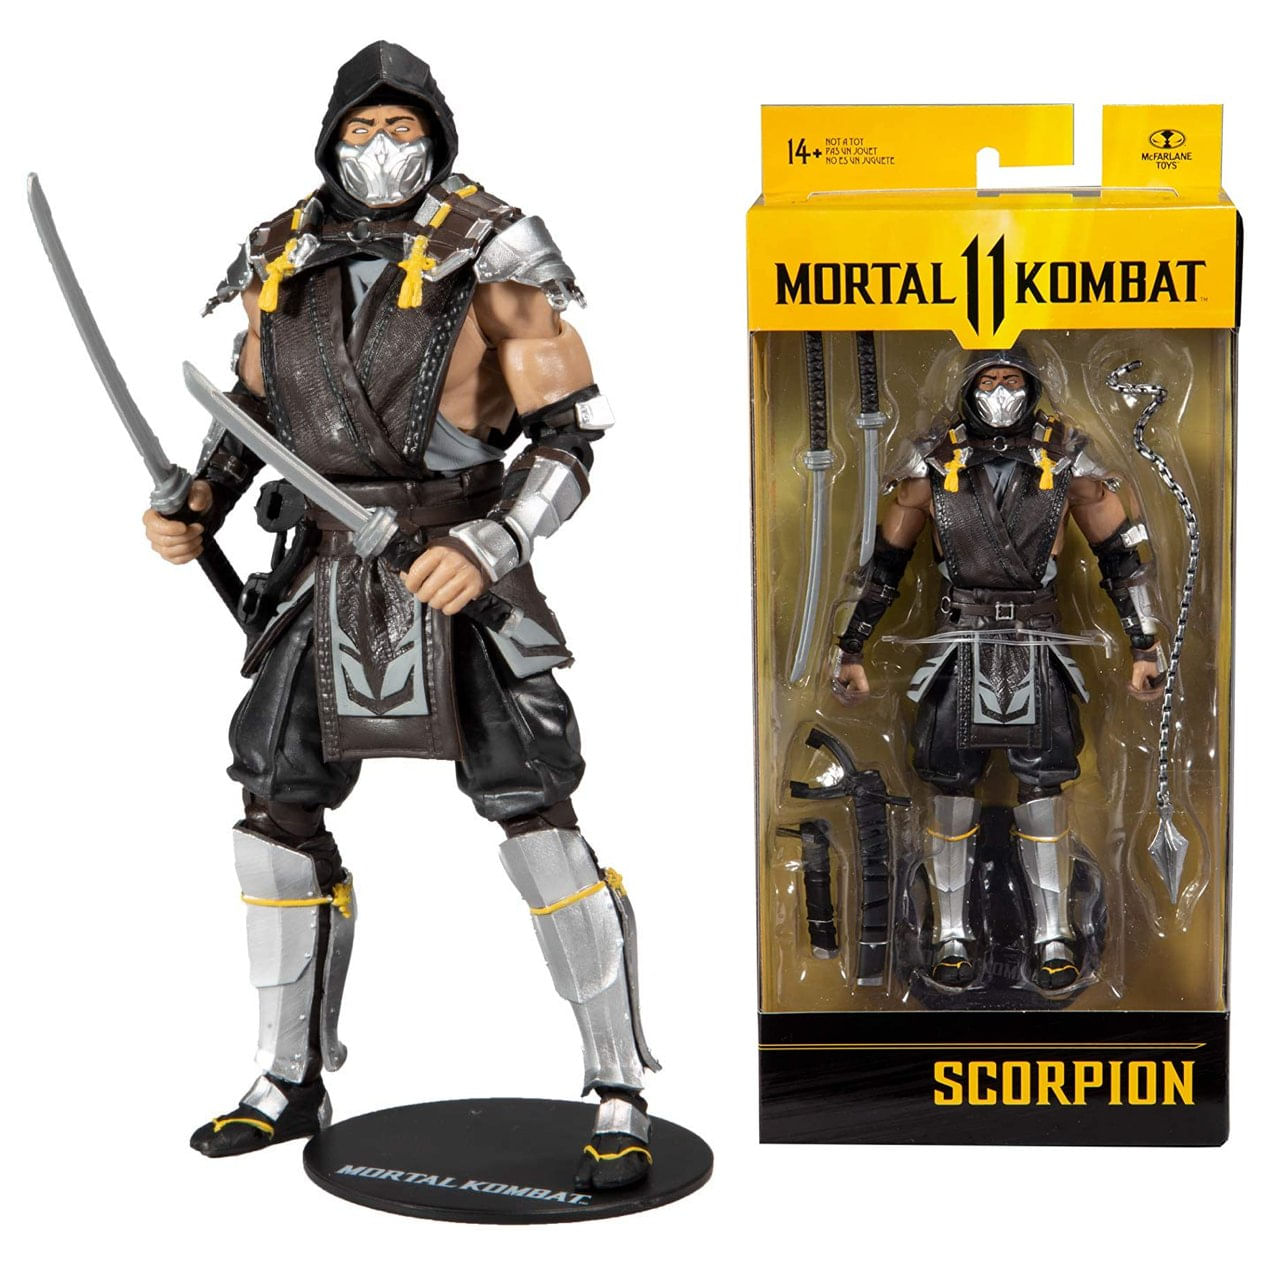 Boneco Scorpion - Mortal Kombat 11 Action Figure - Mcfarlane